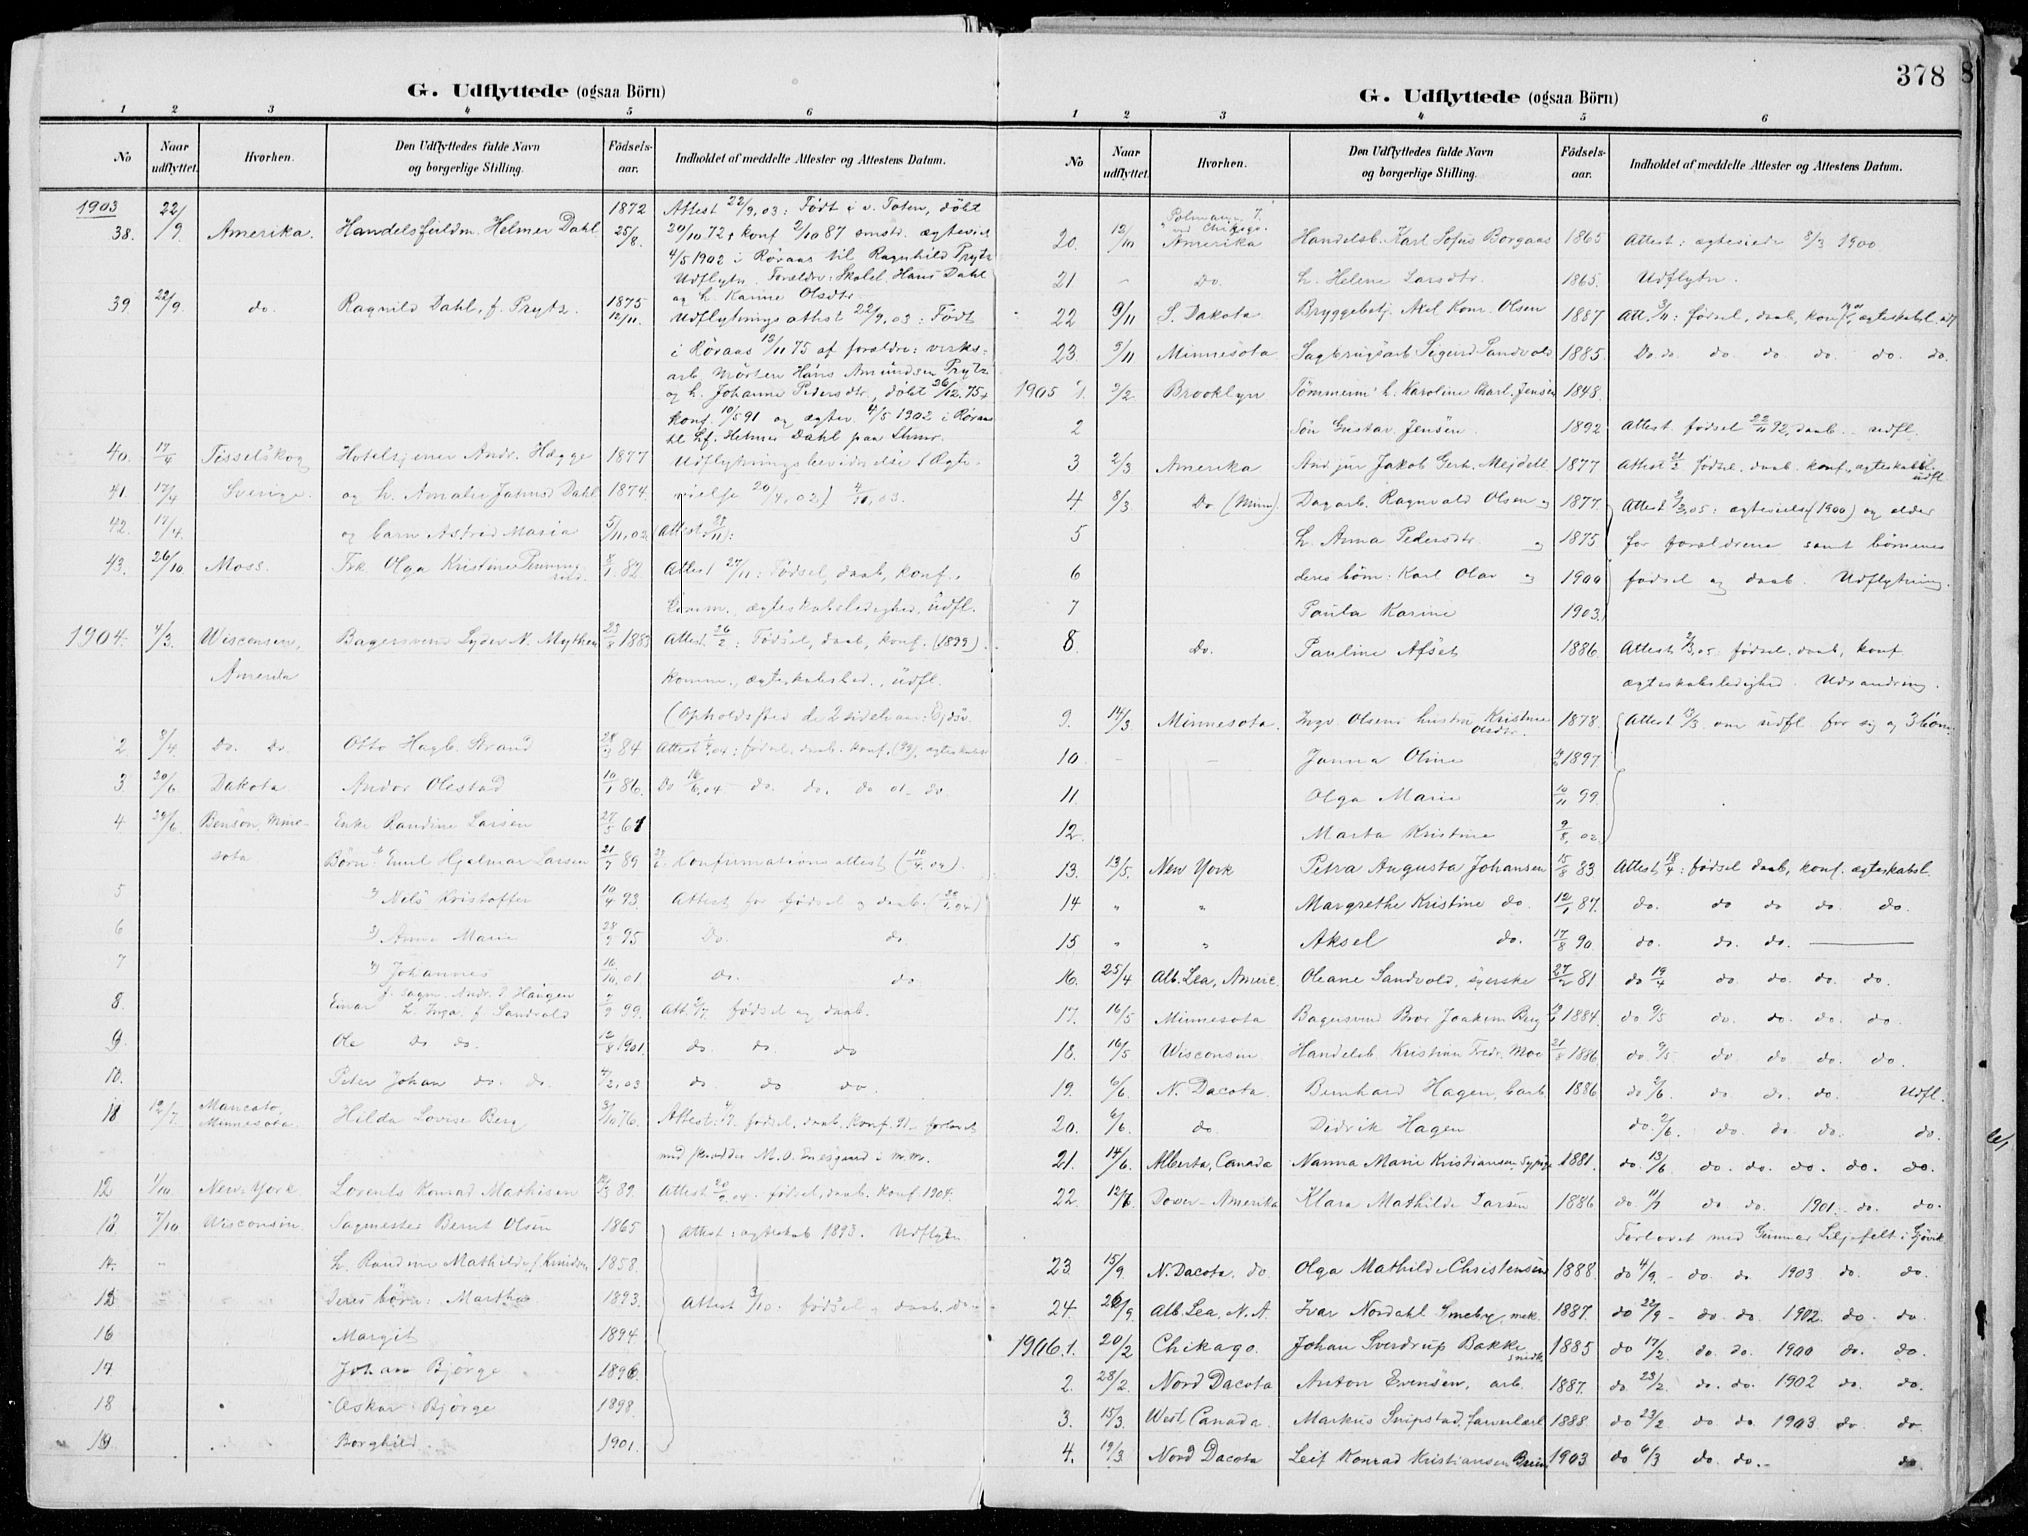 SAH, Lillehammer prestekontor, Ministerialbok nr. 1, 1901-1916, s. 378